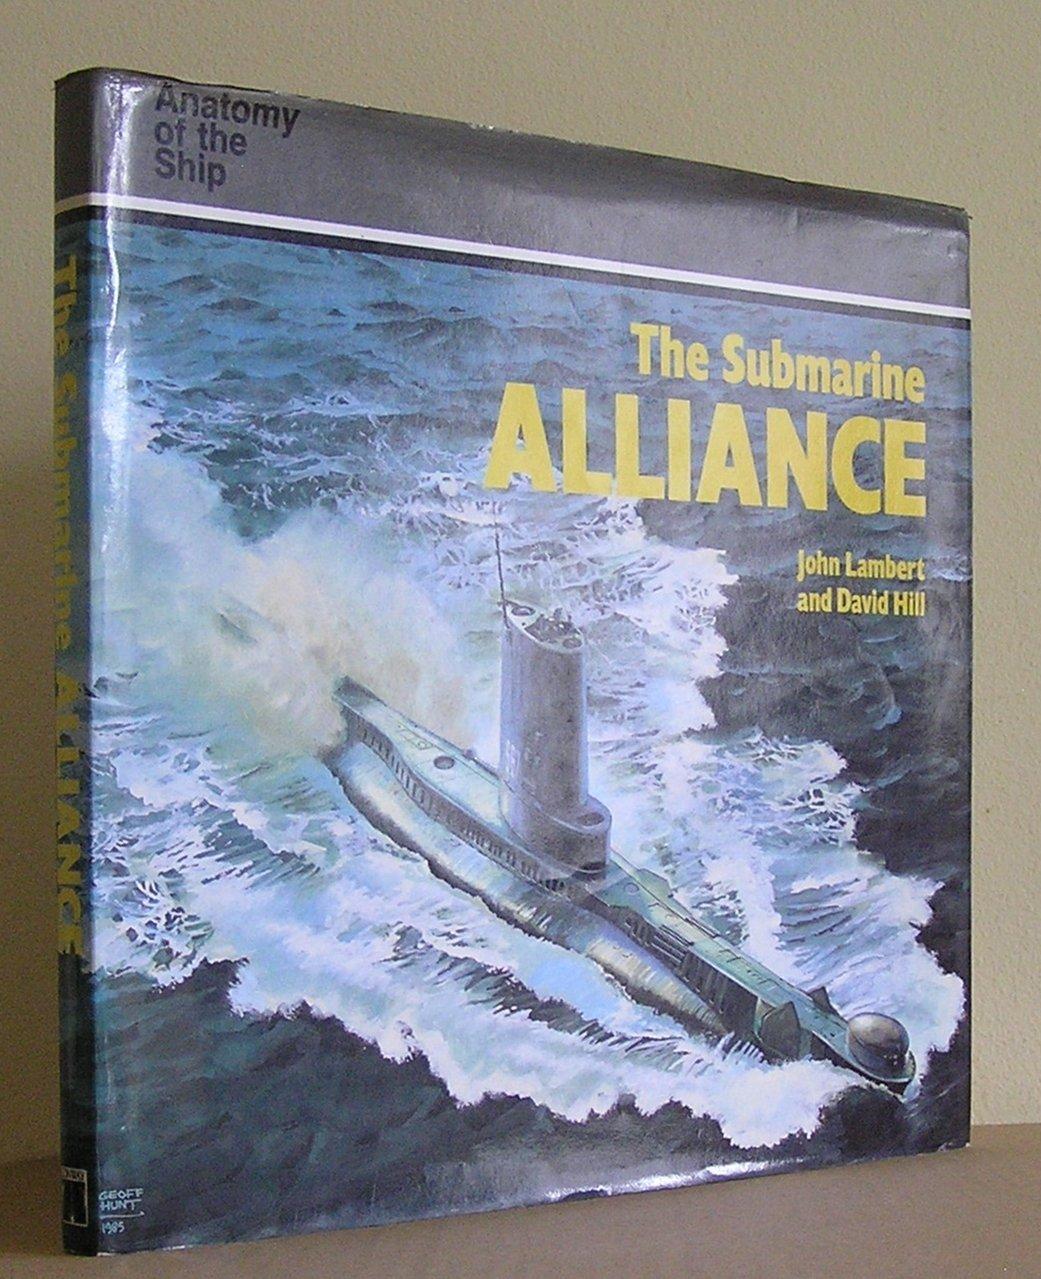 Amazon.com: Submarine Alliance (Anatomy of the Ship) (9780870216886 ...